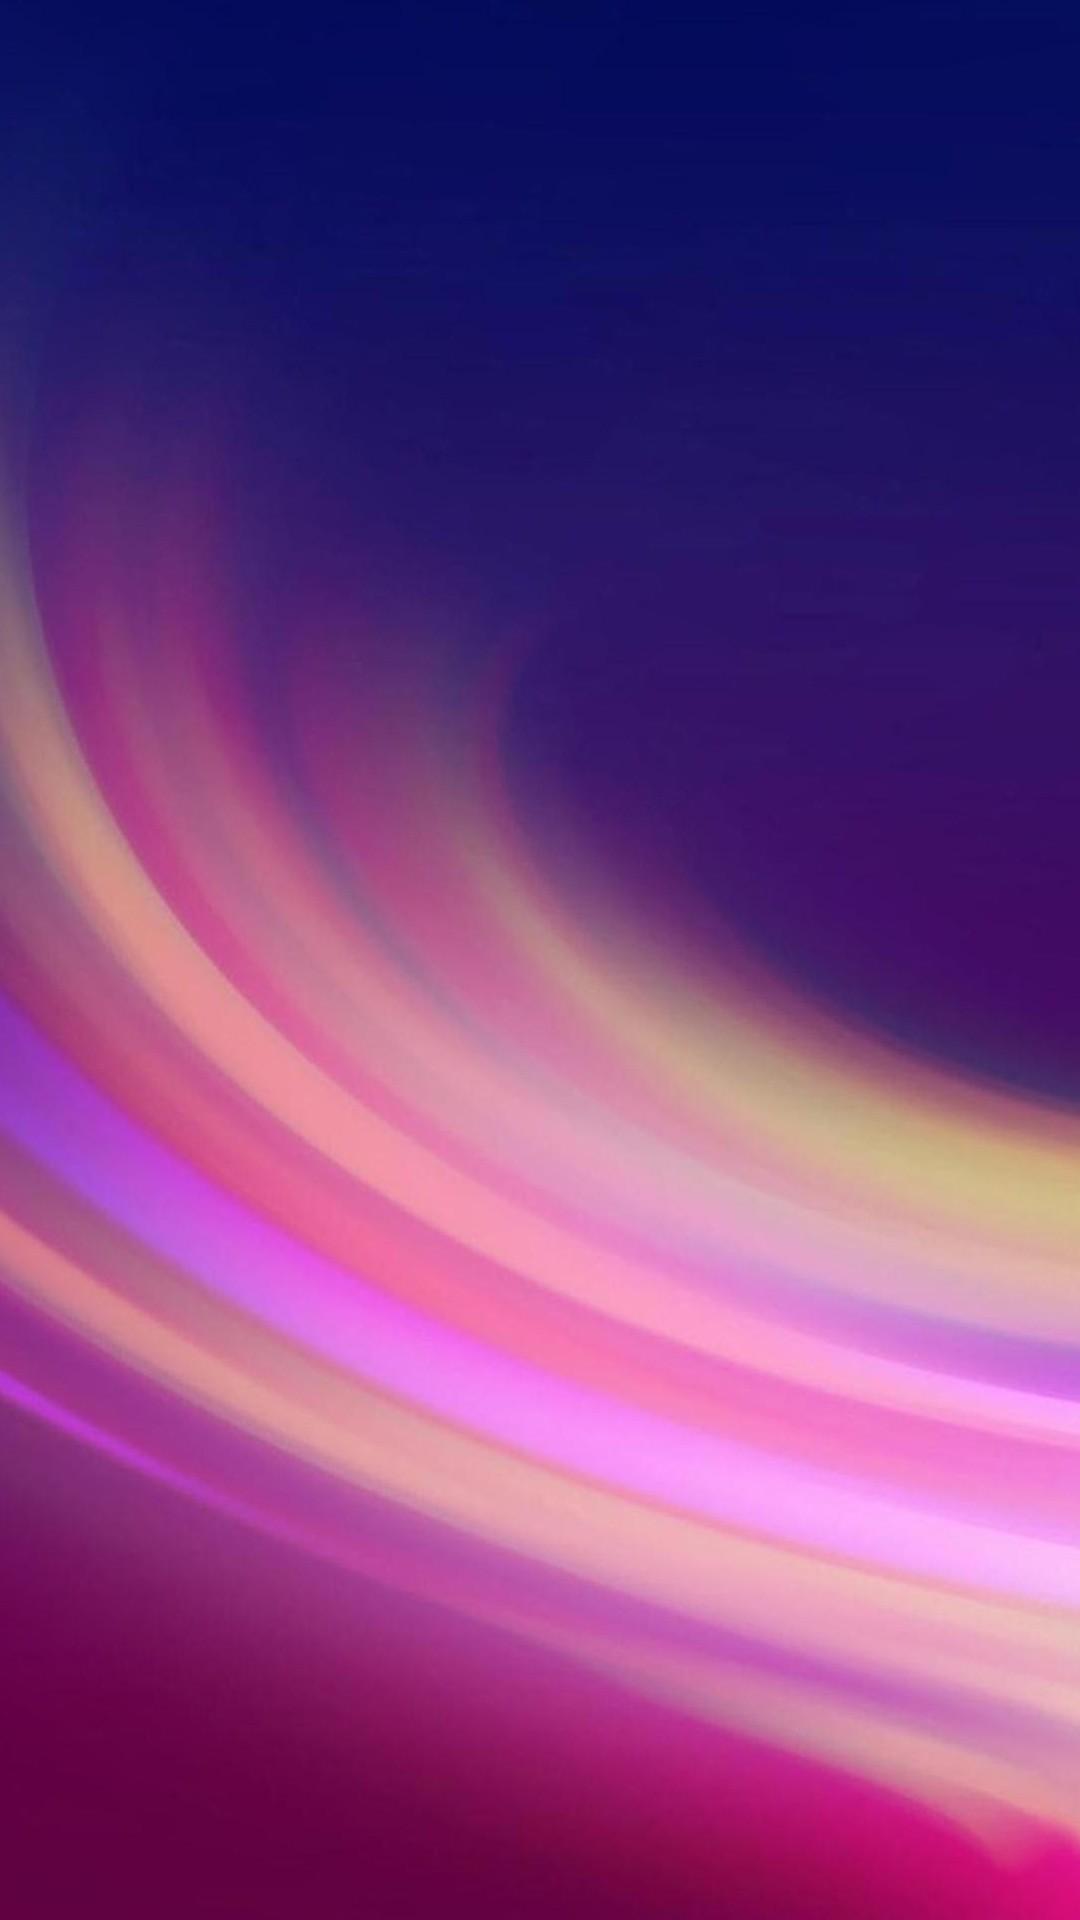 Abstract 05 Hd Wallpaper For Desktop 1080x1920